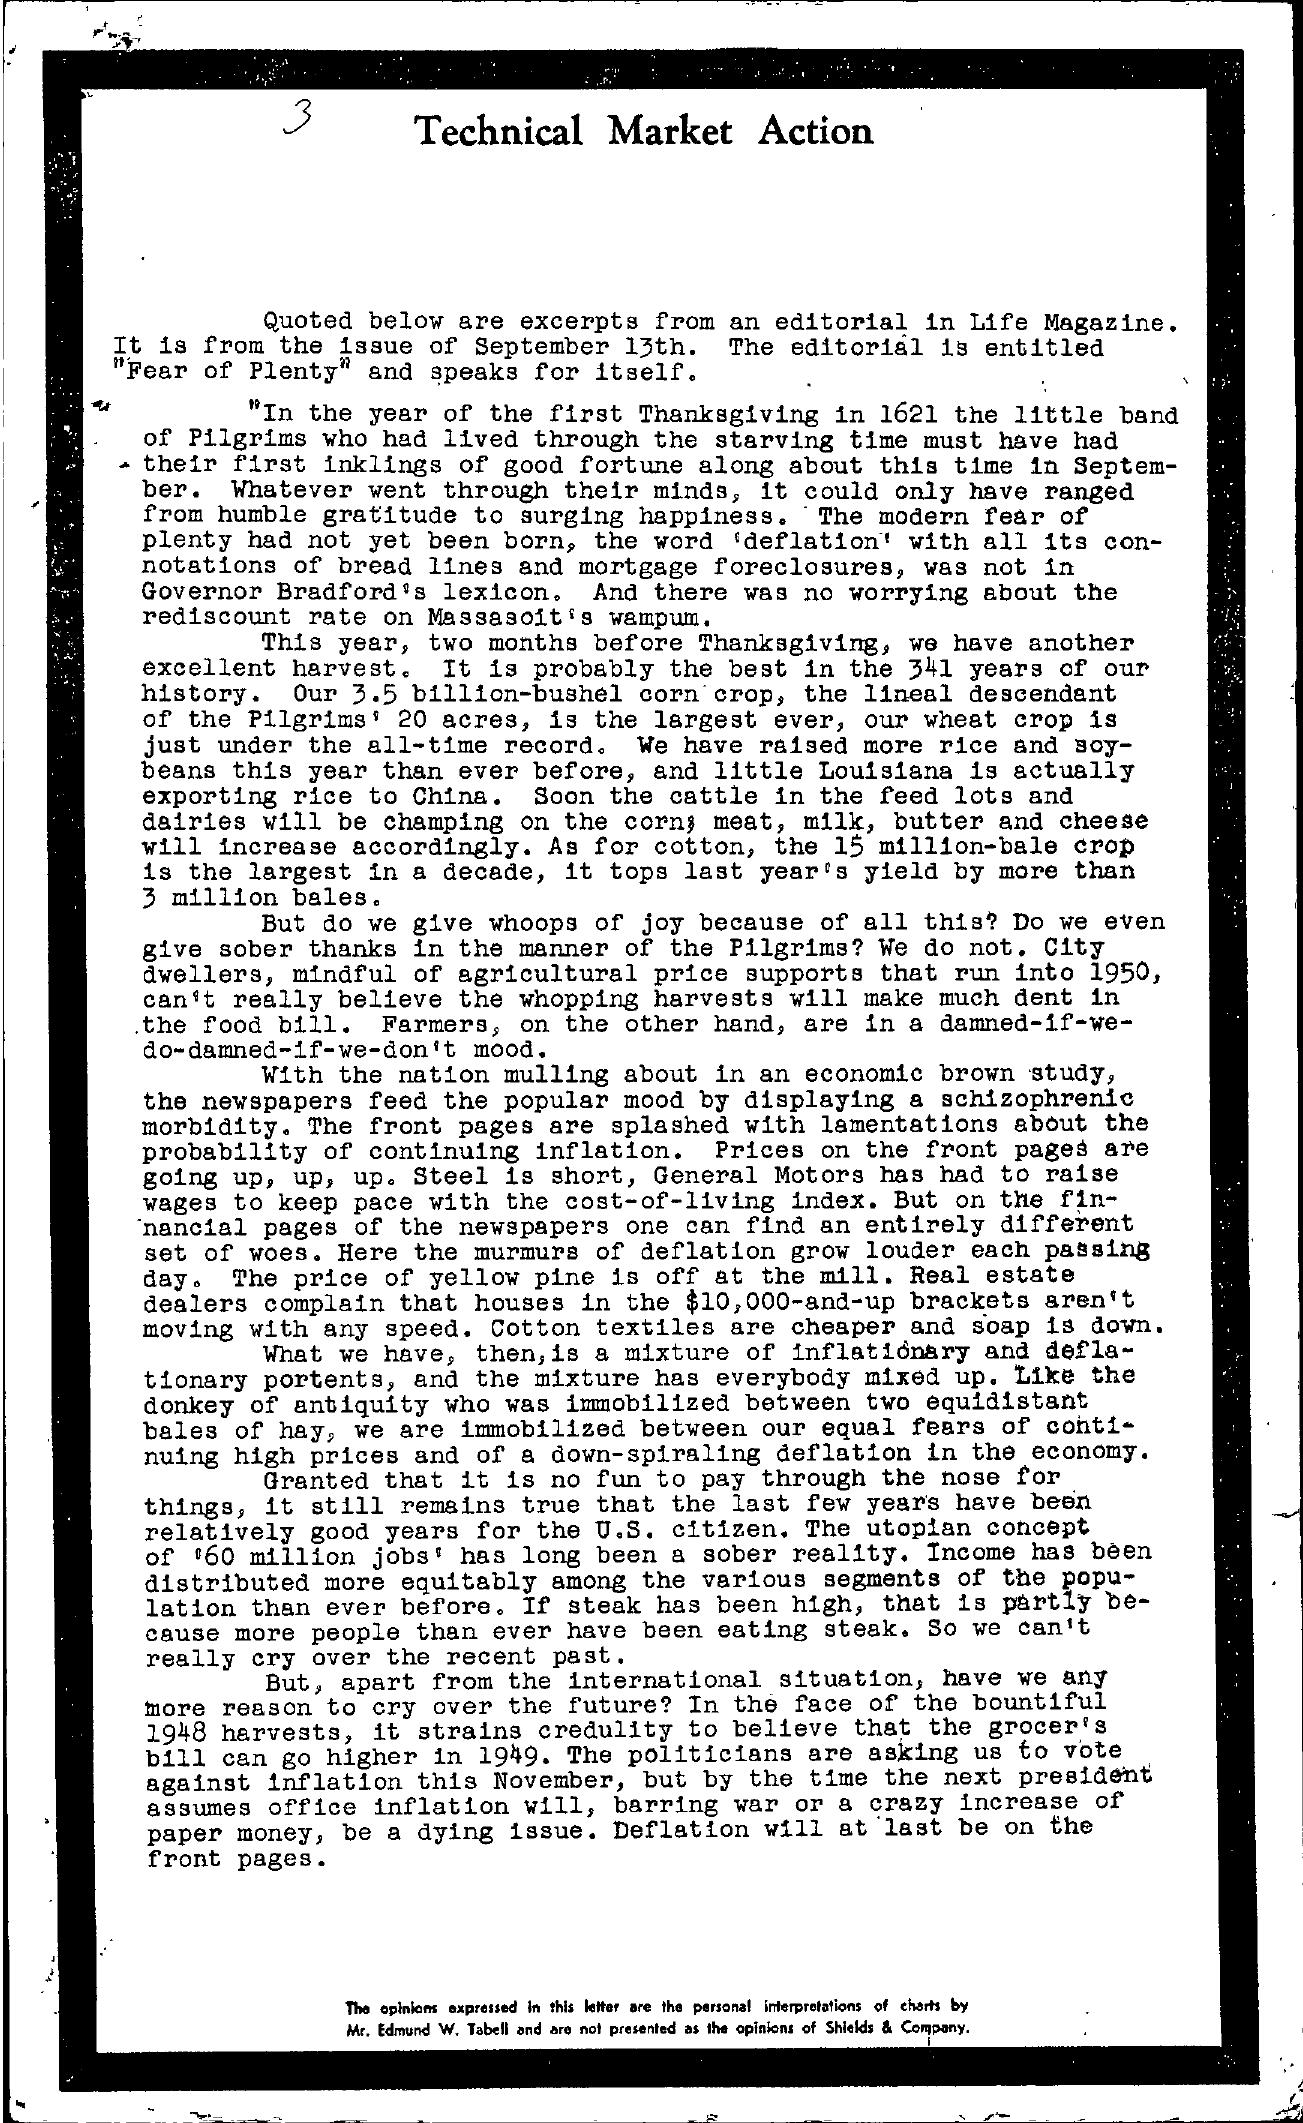 Tabell's Market Letter - September 15, 1948 page 1